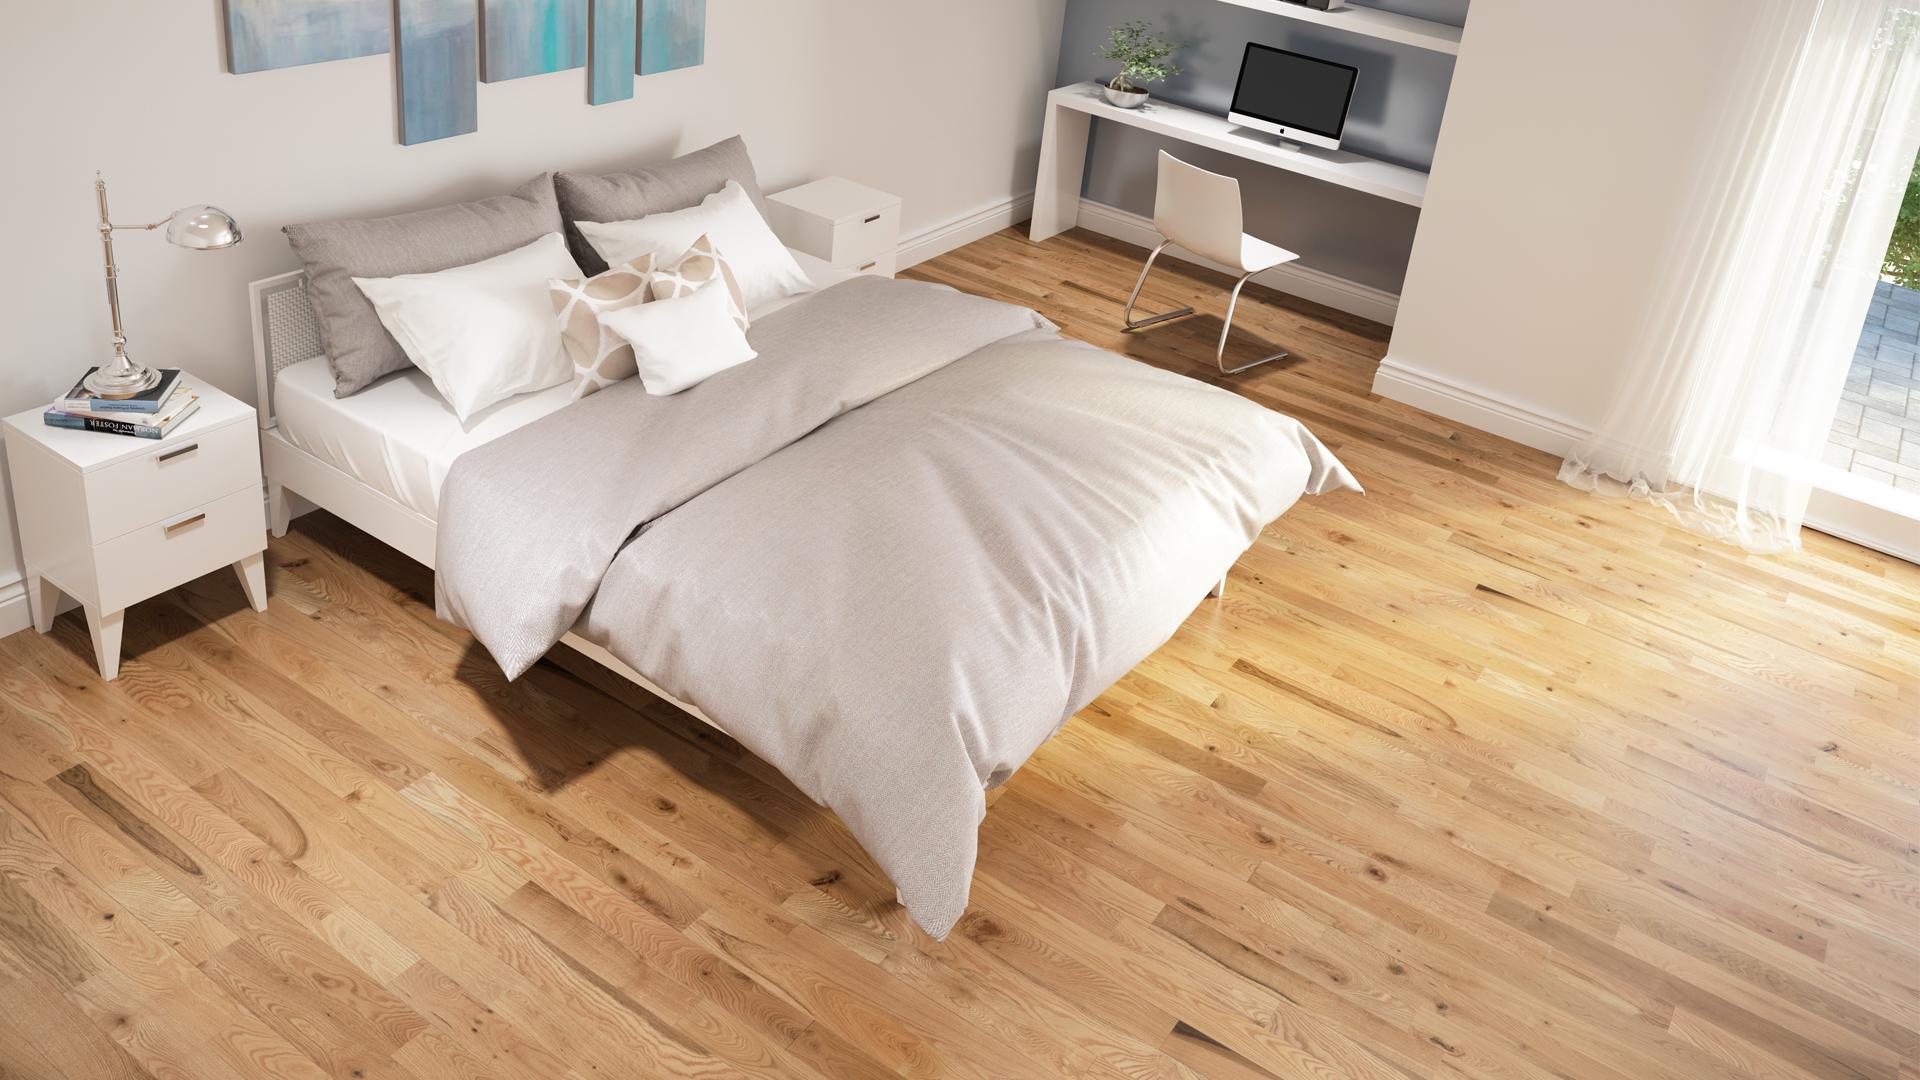 Red oak natural | Dubeau hardwood floors | Bedroom decor